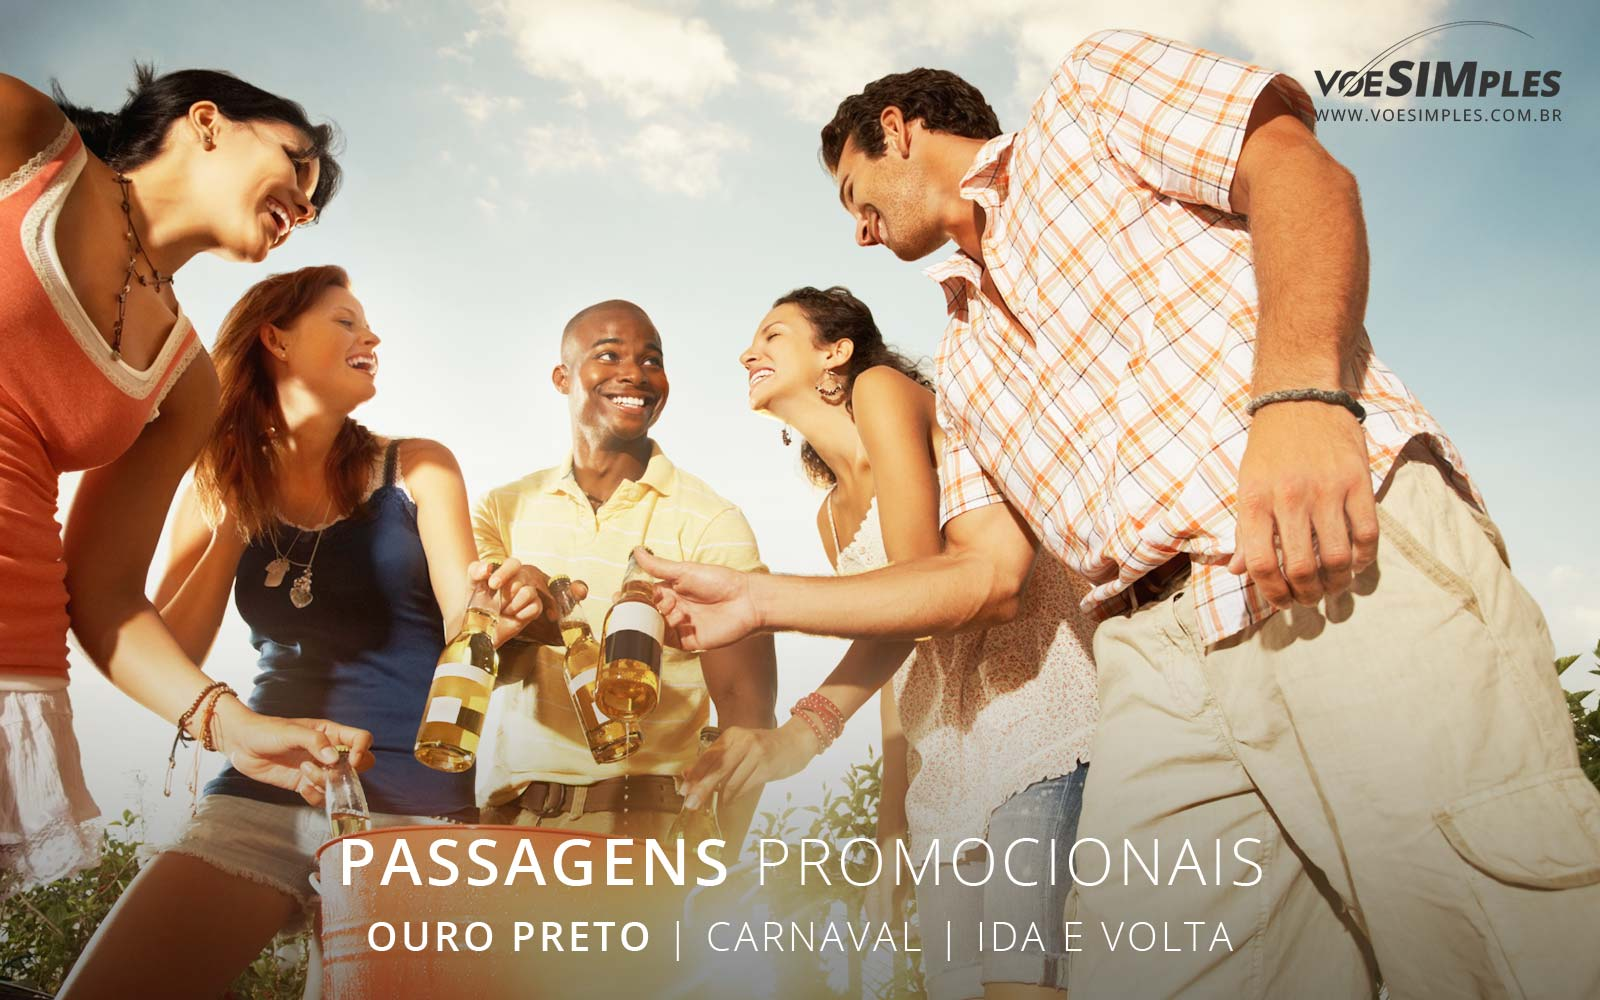 Passagem aérea promocional barata Carnaval 2017